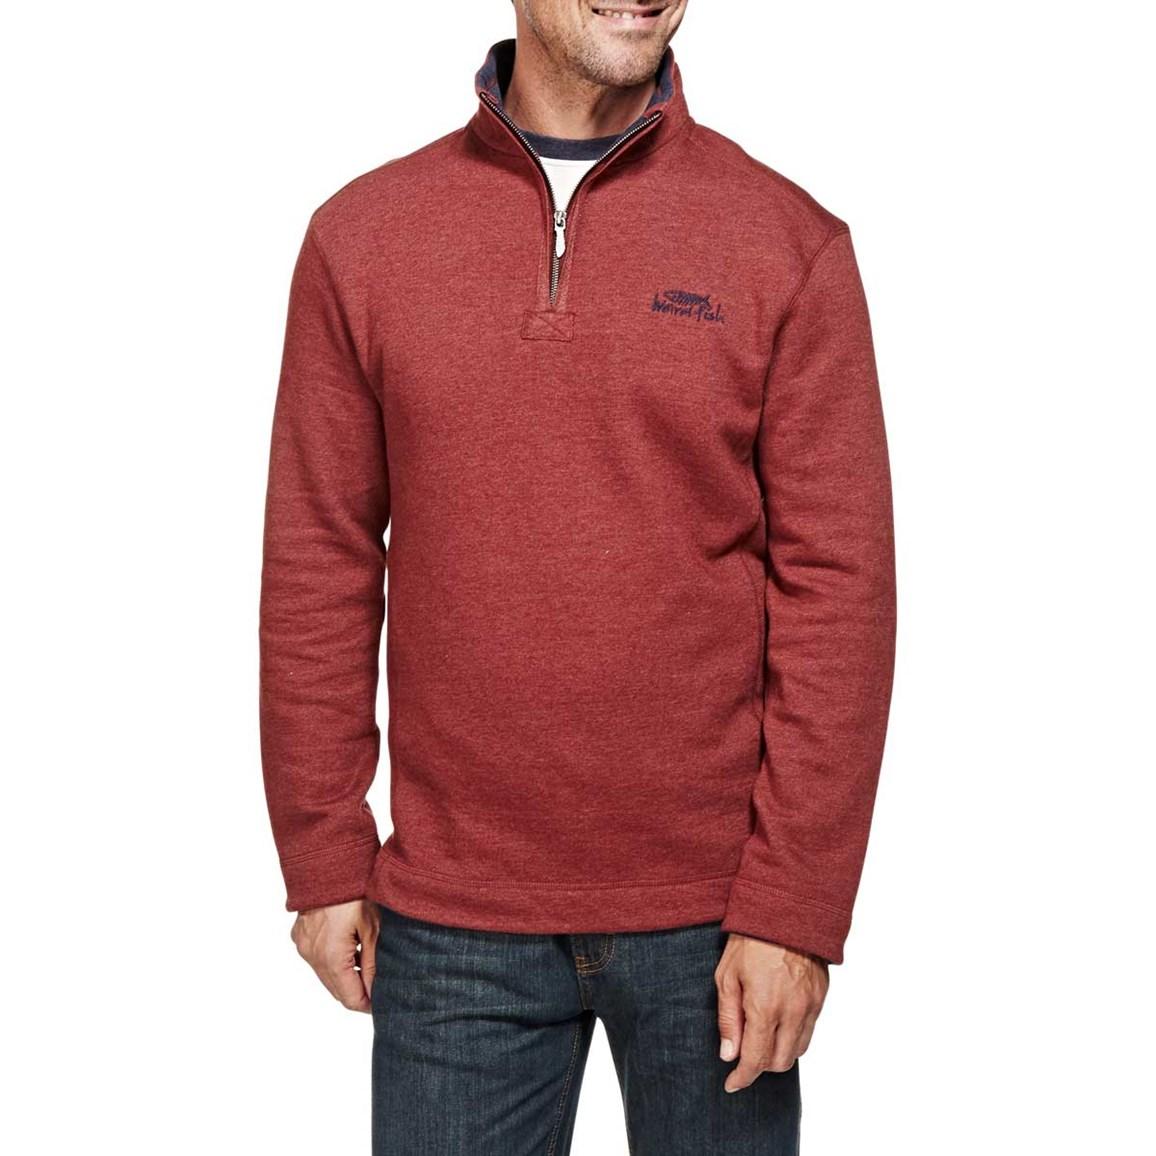 Hail Plain 1/4 Neck Zip Embroidered Sweatshirt Conker